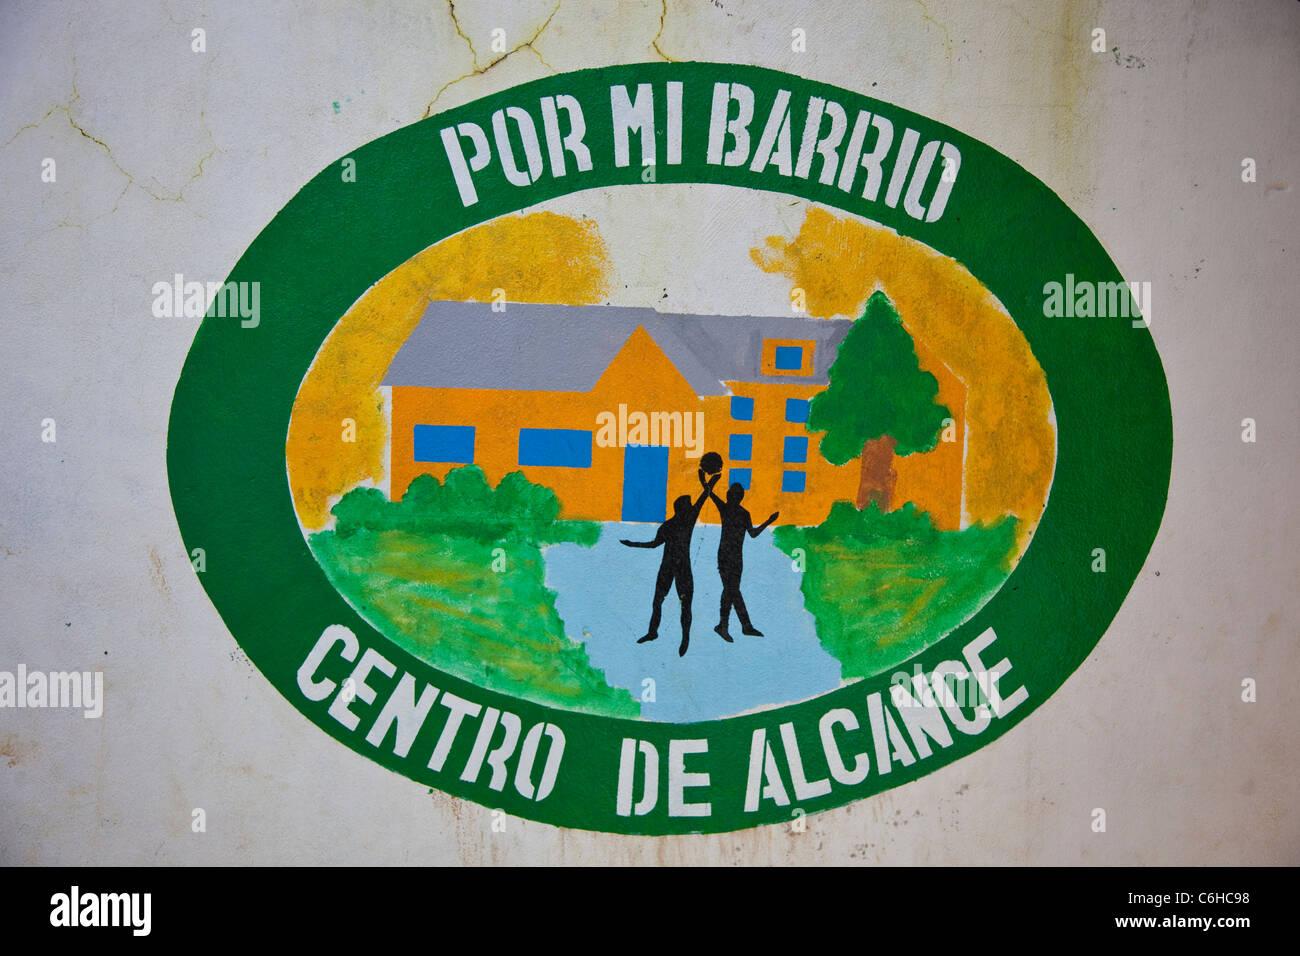 USAID development youth project , Por Mi Barrio, against gangs, San Salvador, El Salvador Stock Photo